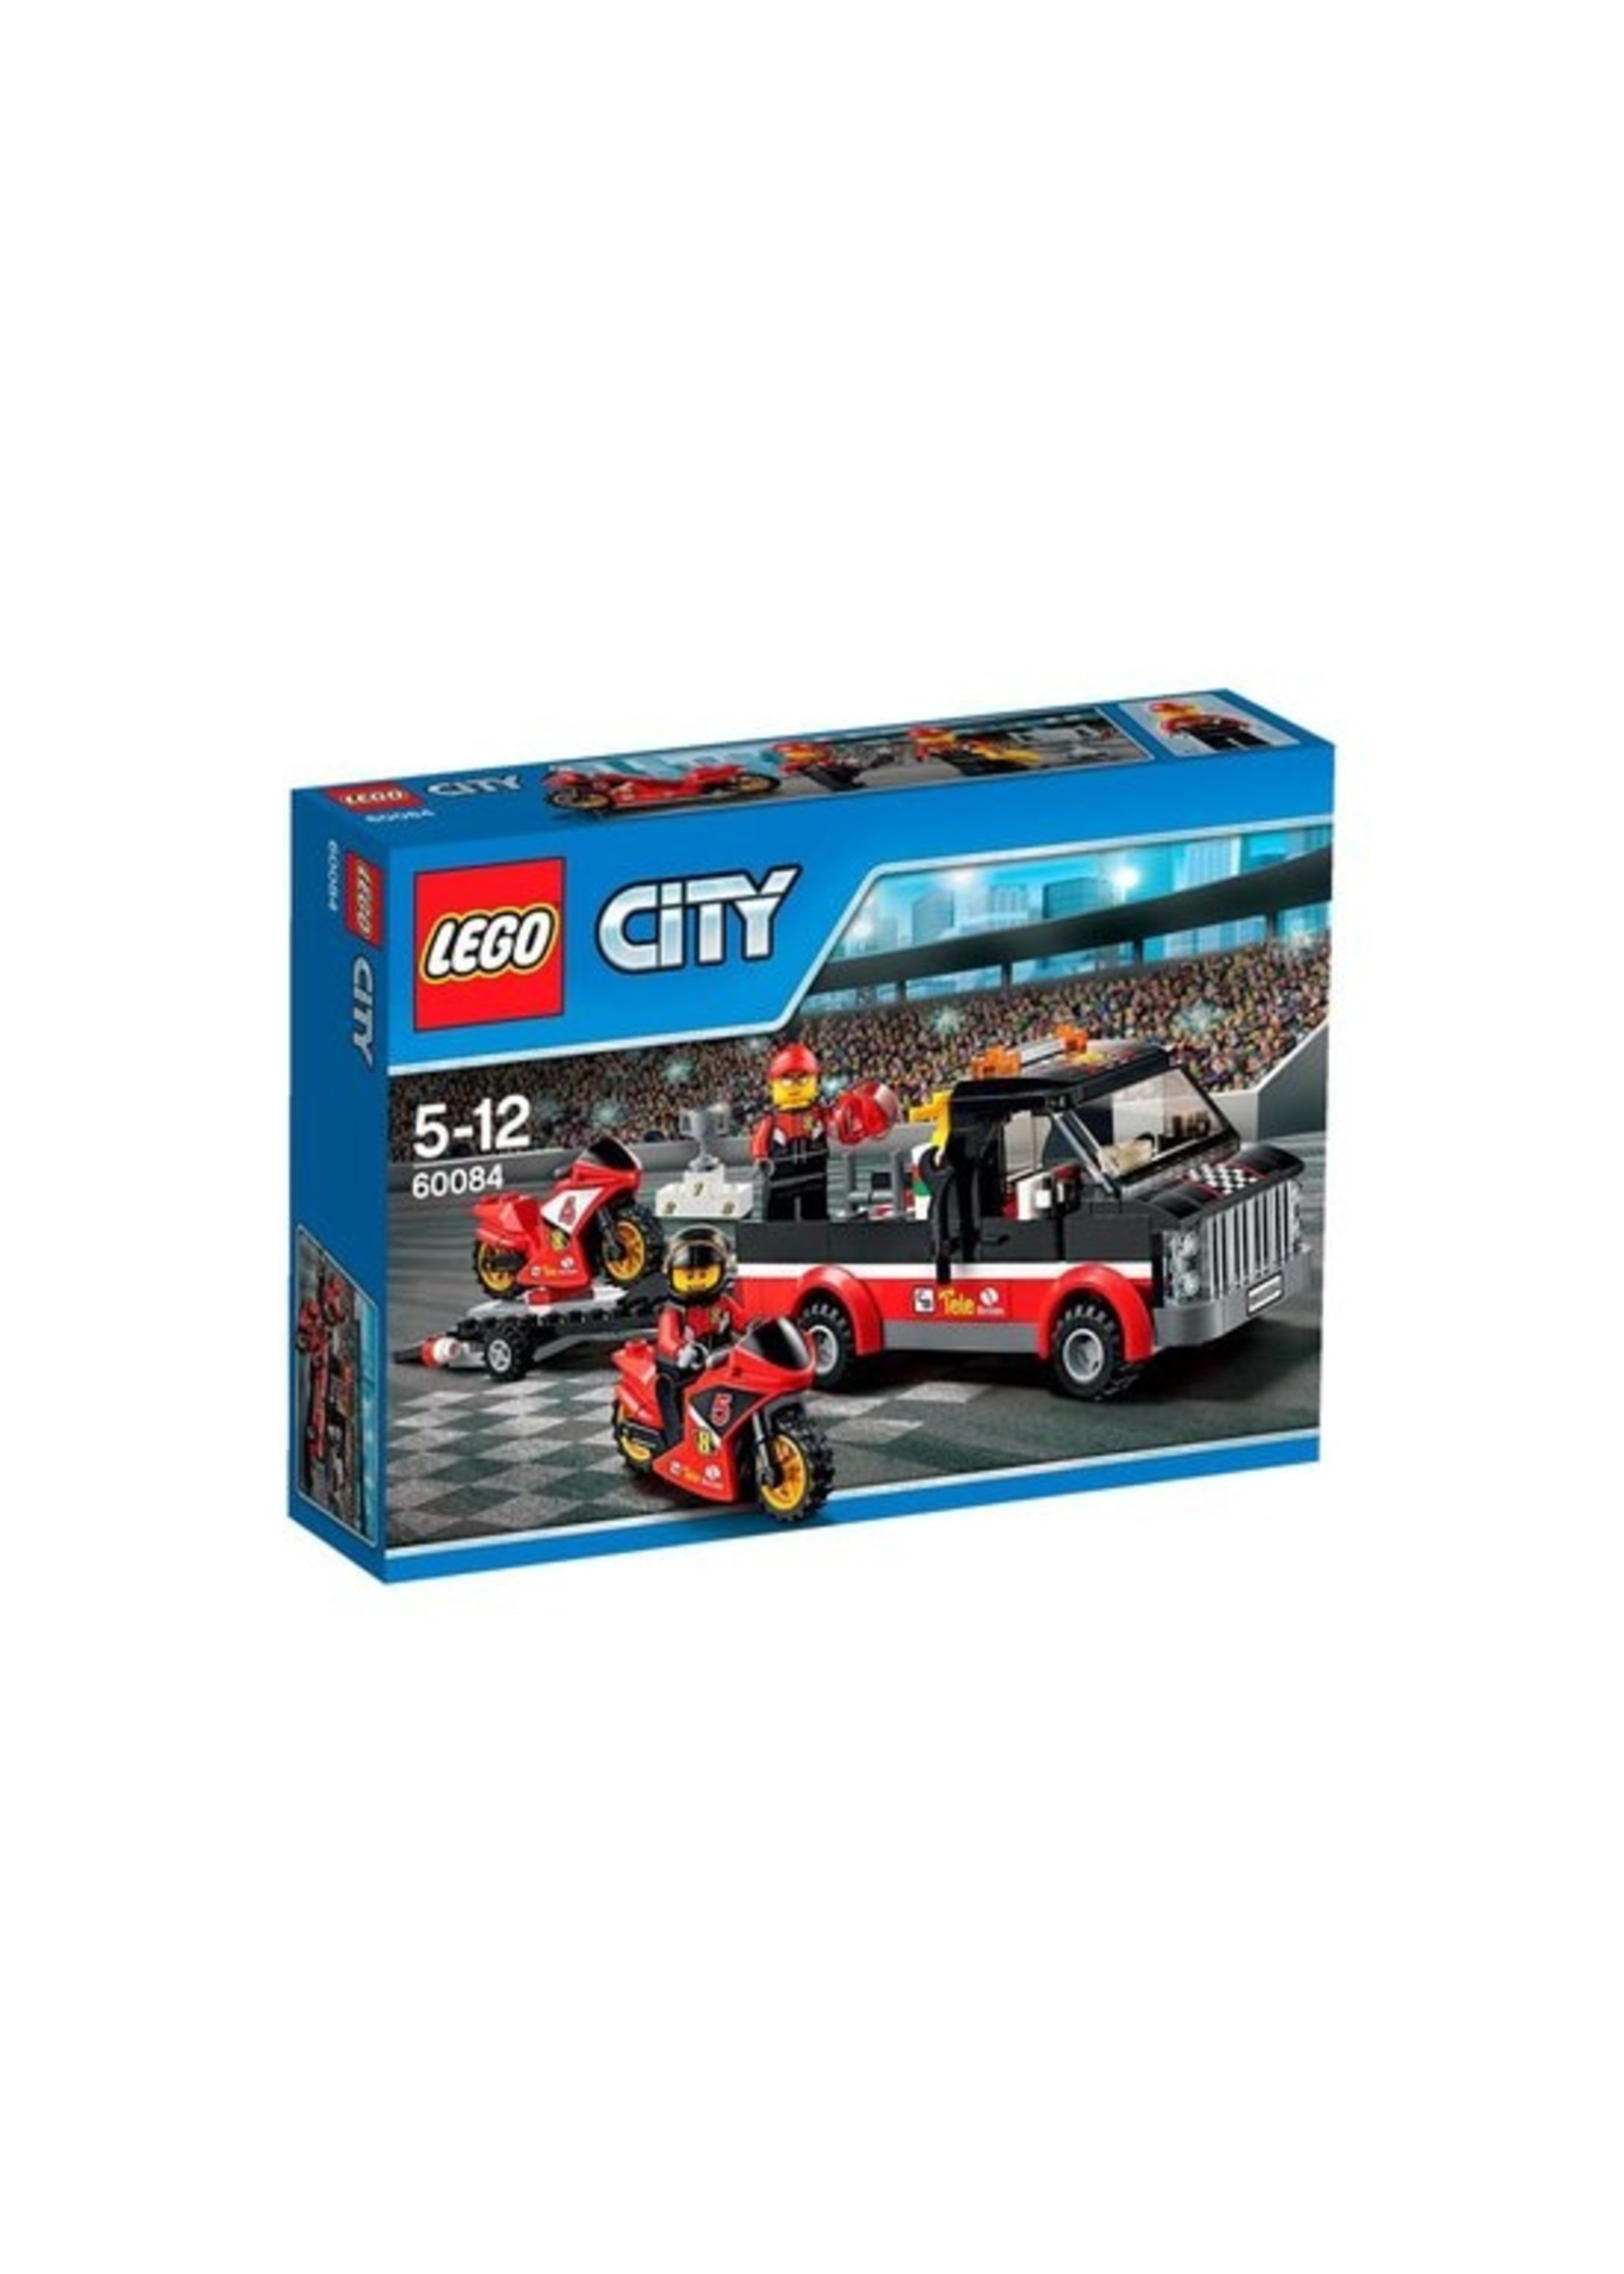 LEGO City Racemotor Transport - 60084